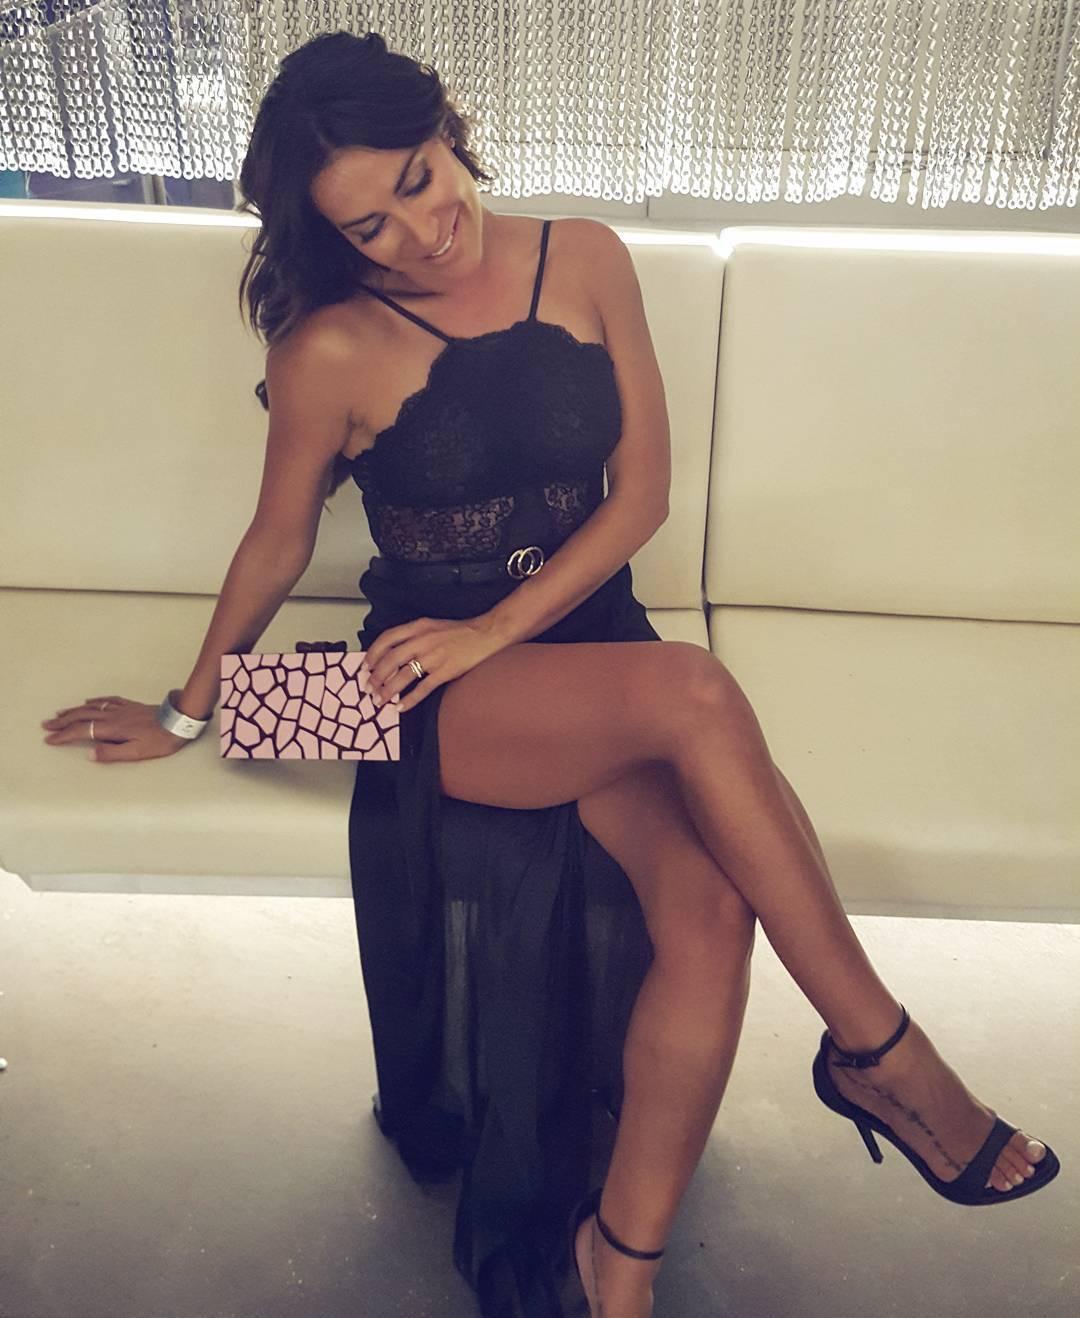 Paul mccartney heather mills hit the divorce courts XXX videos Aishwarya rai,Elisabeth Erm Sexy Topless